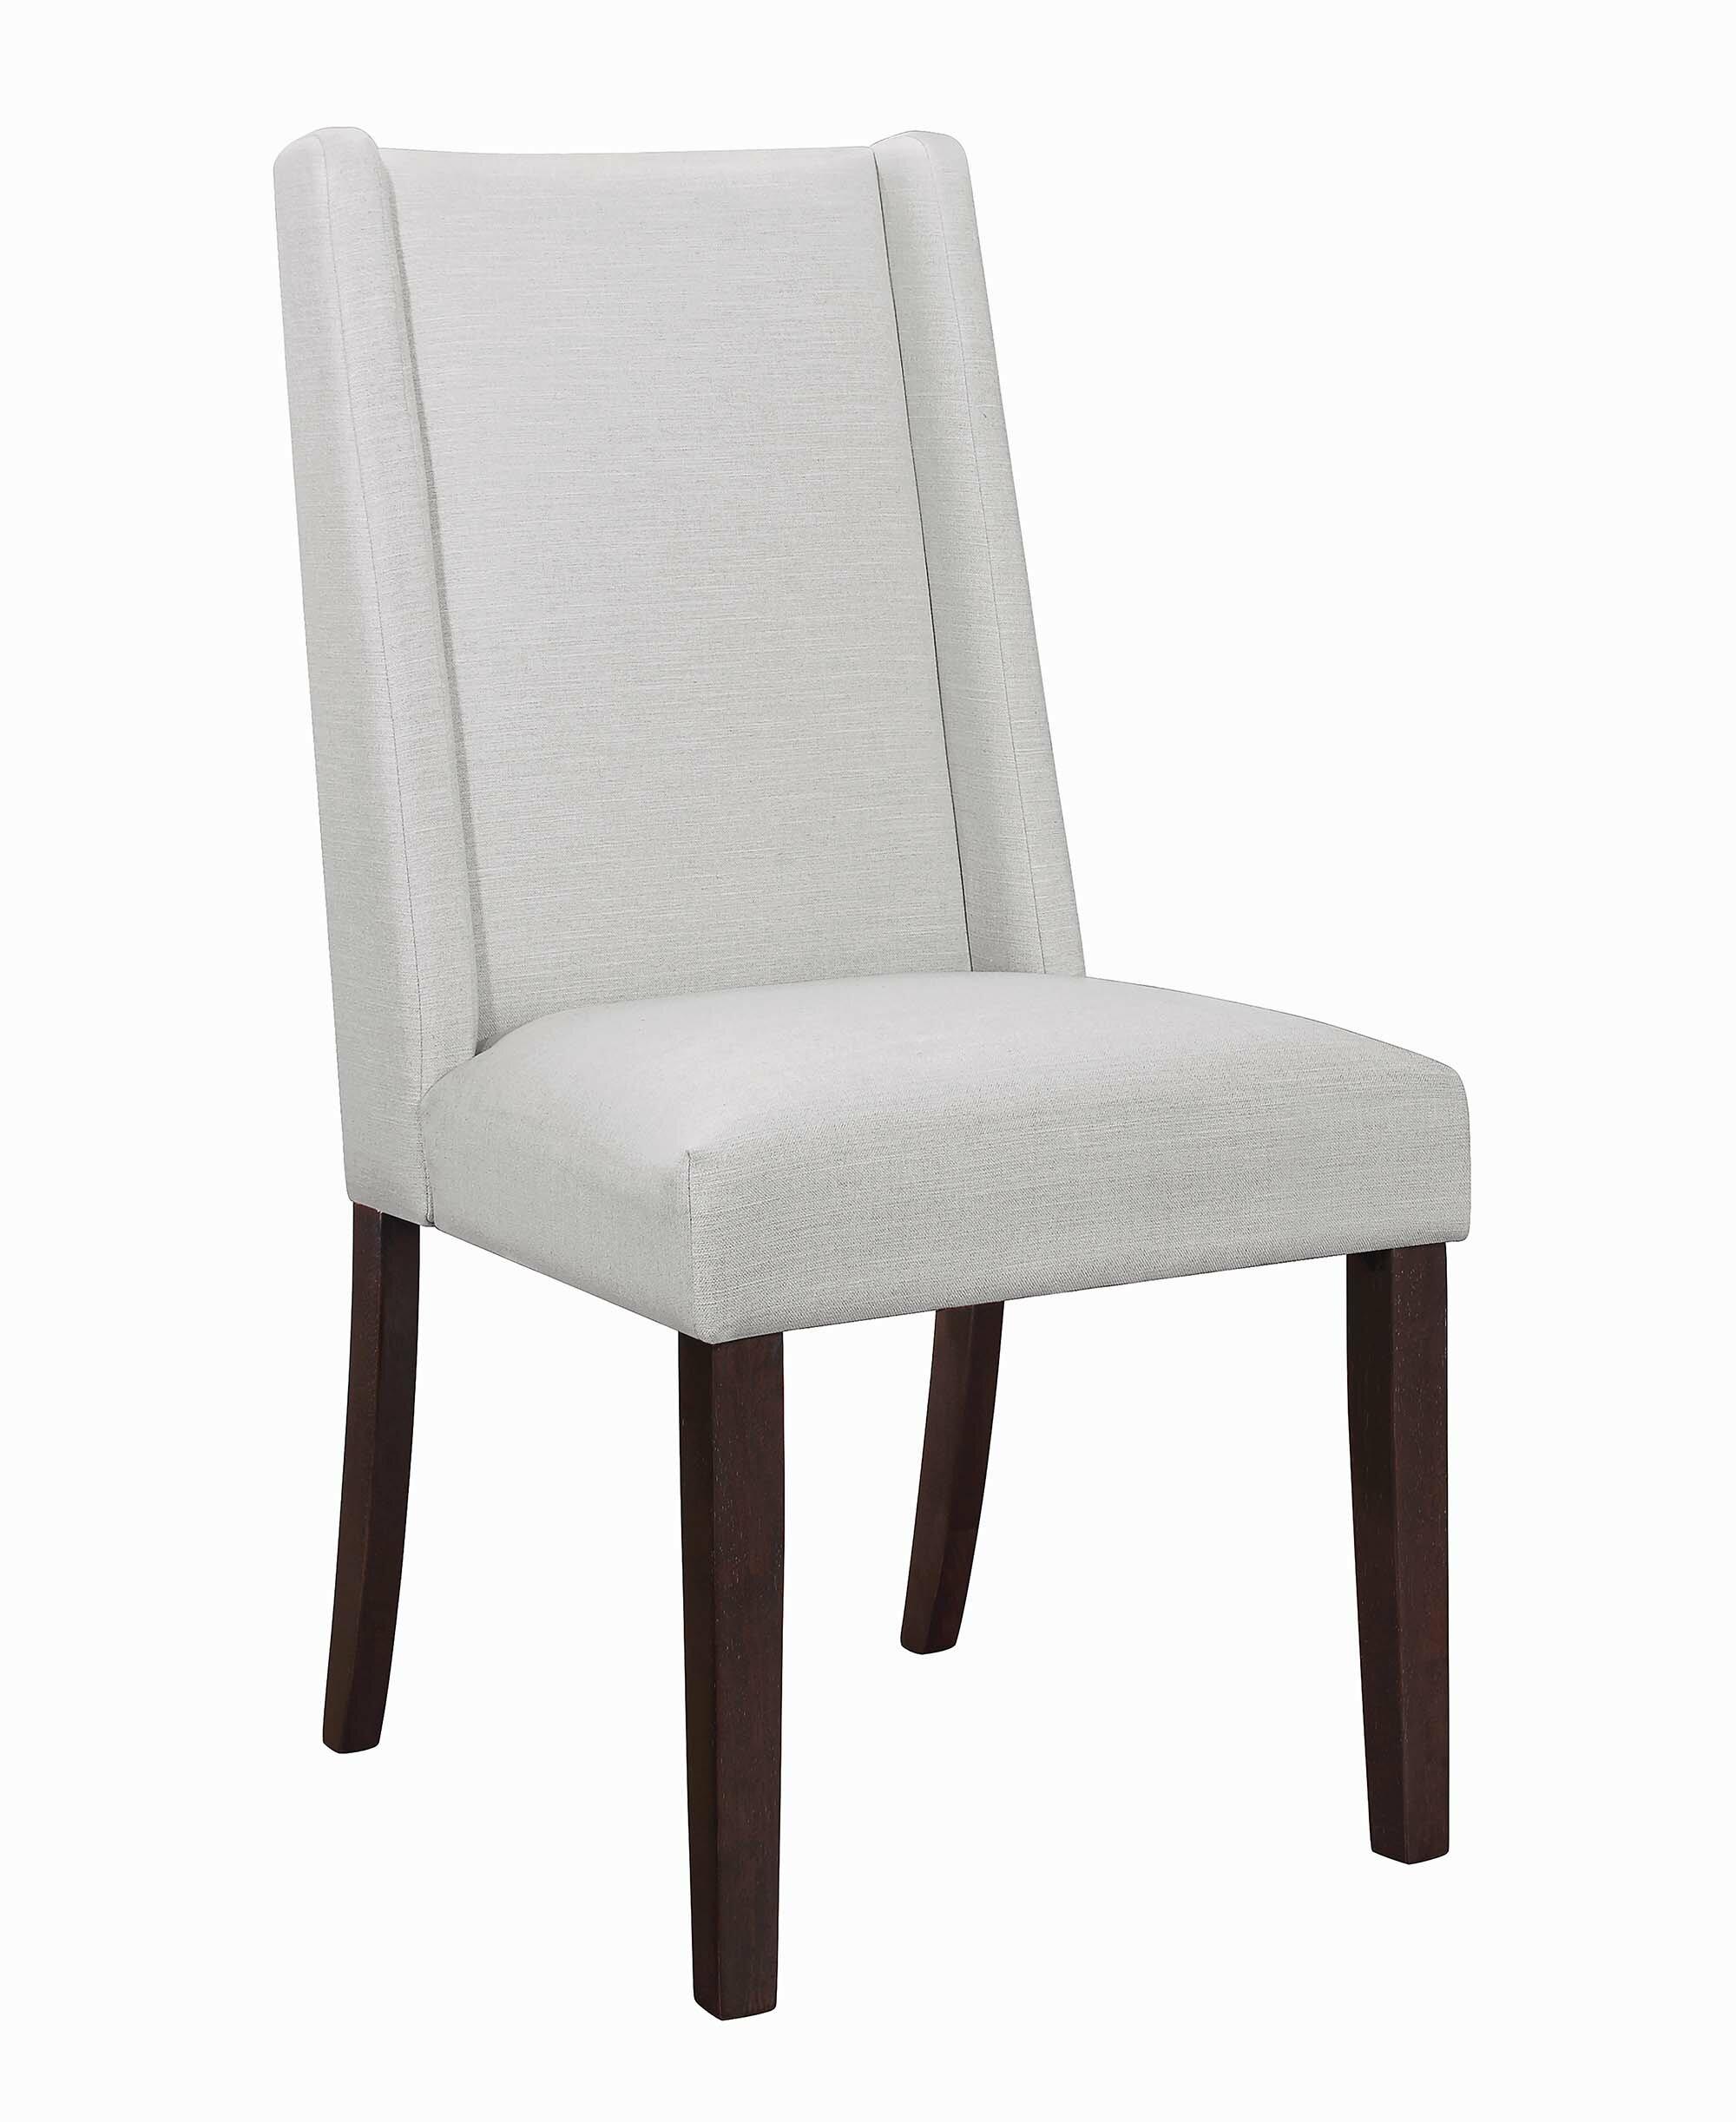 Rosdorf Park Leer Upholstered Dining Chair Wayfair